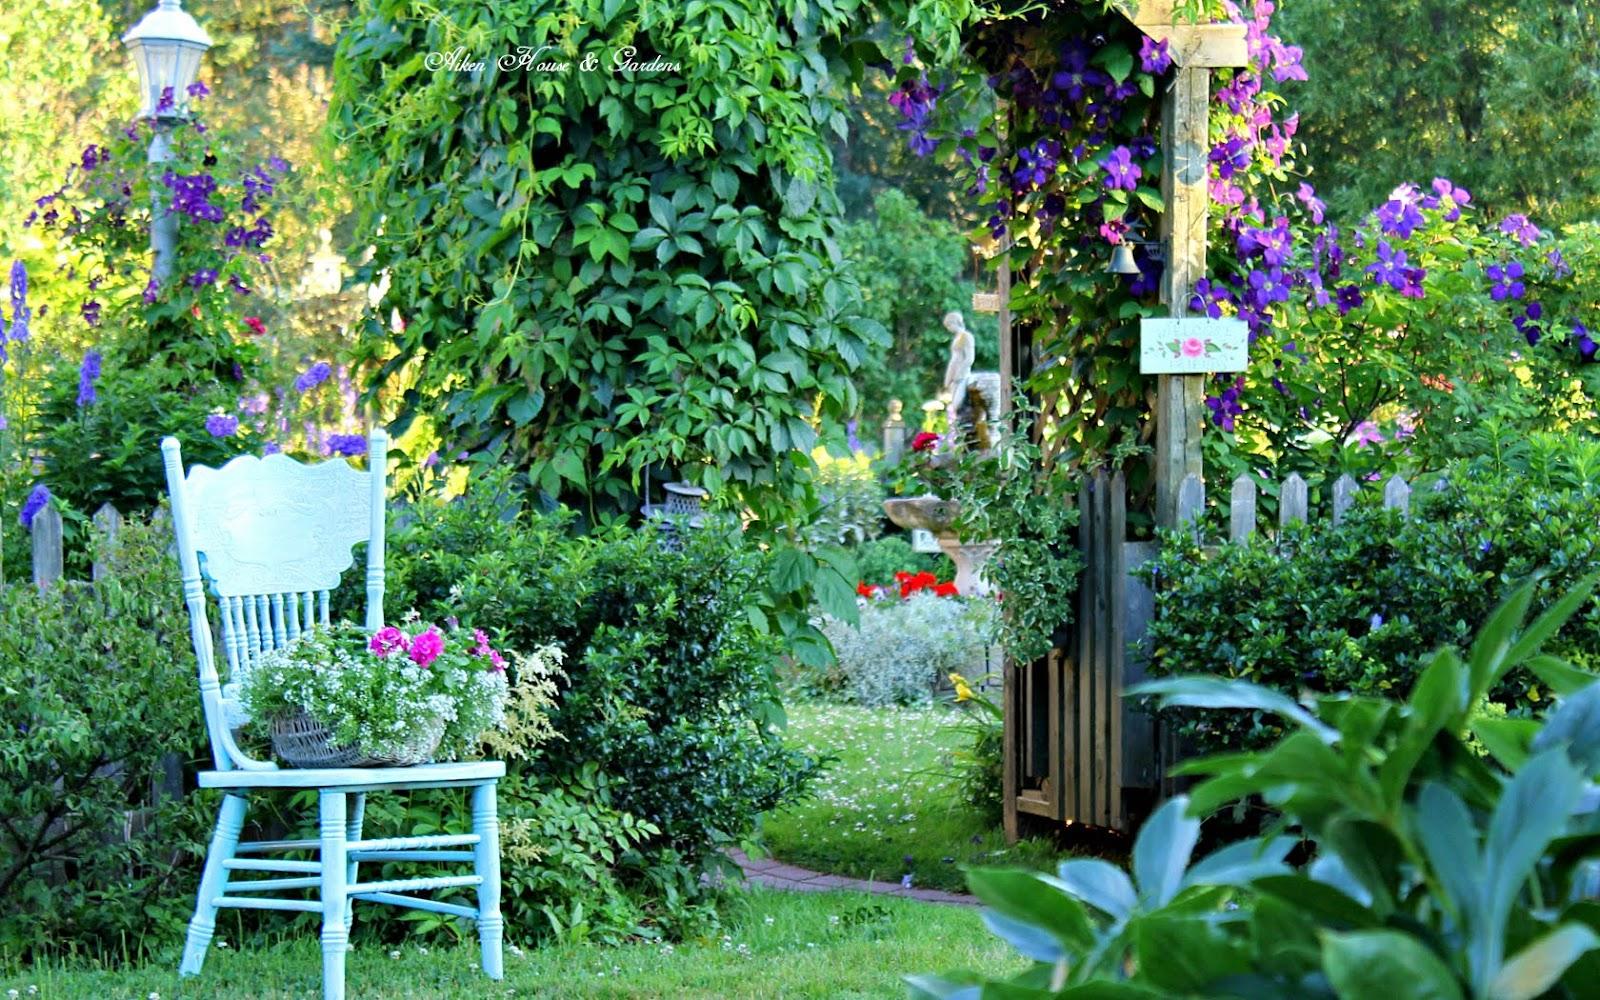 Aiken house gardens french garden blues for Aiken house